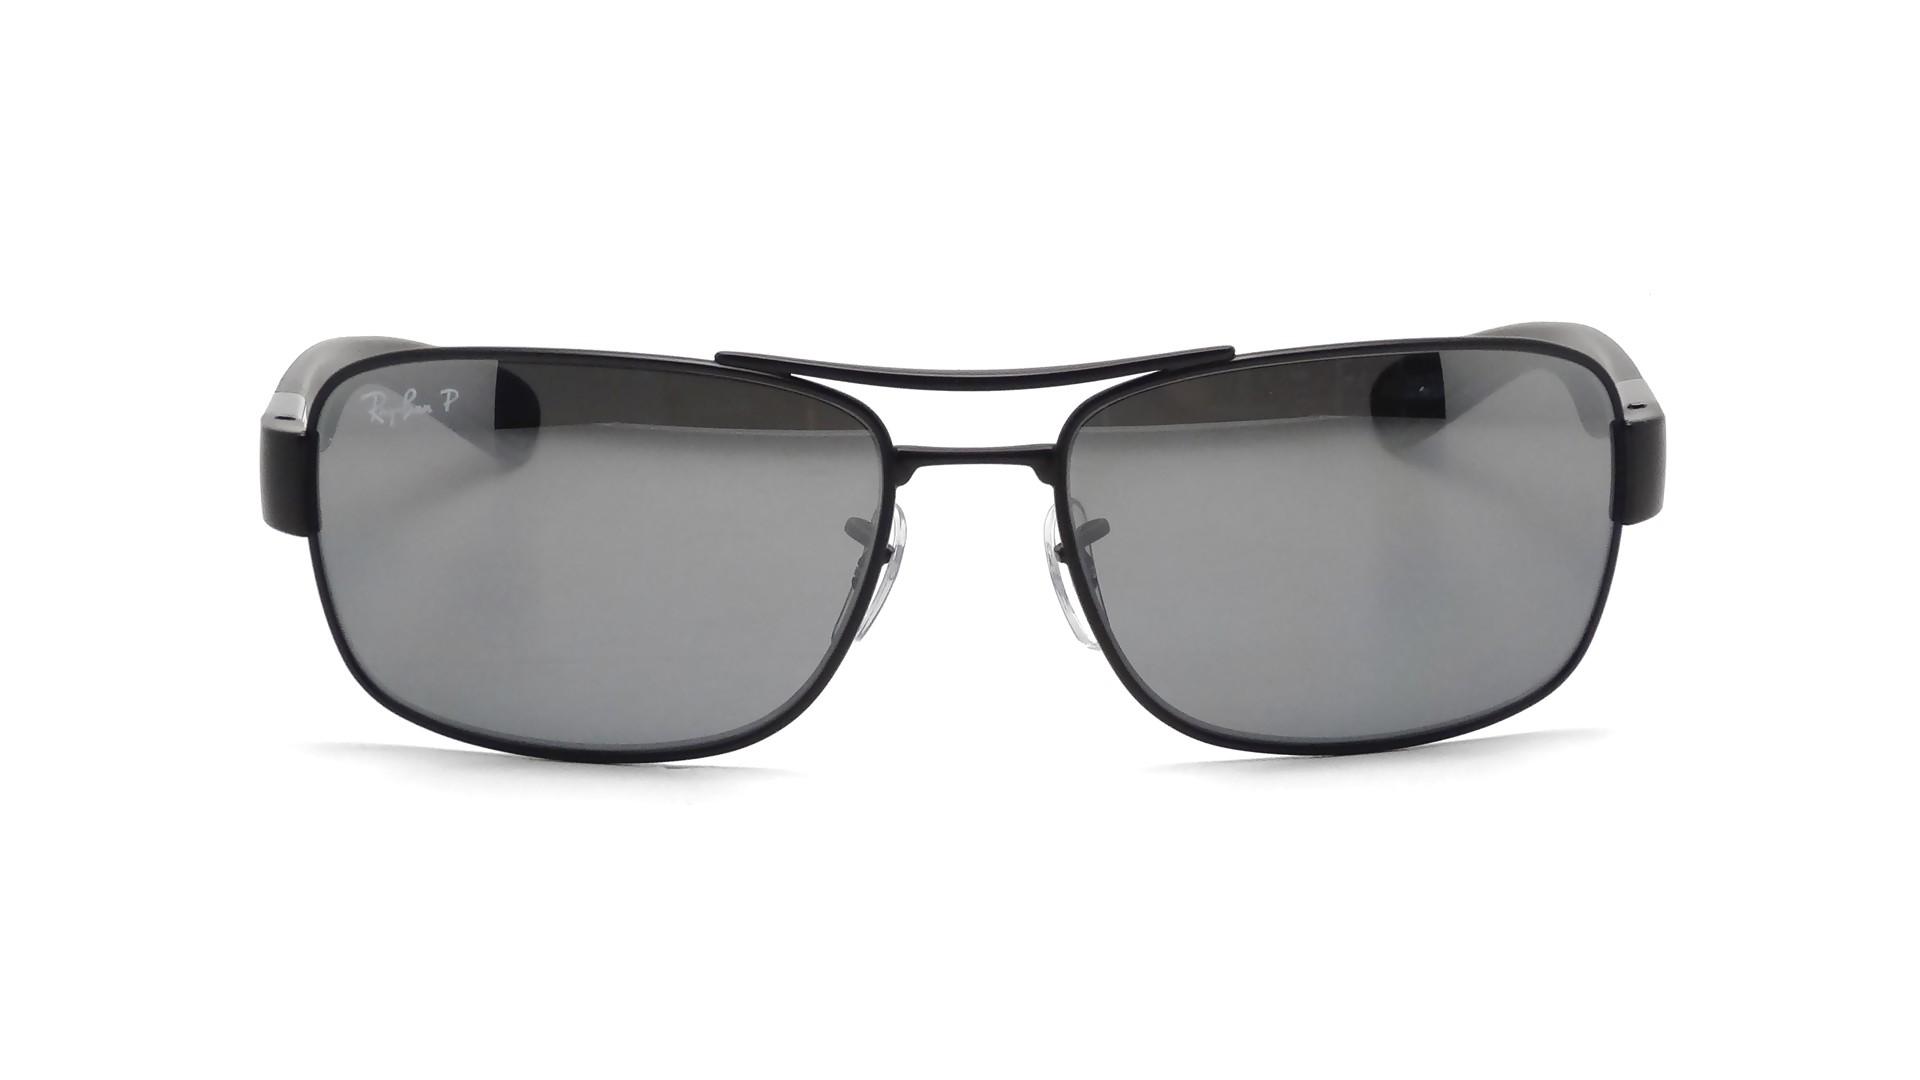 1957cb5fdc3 Sunglasses Ray-Ban RB3522 006 82 61-17 Black Medium Polarized Mirror